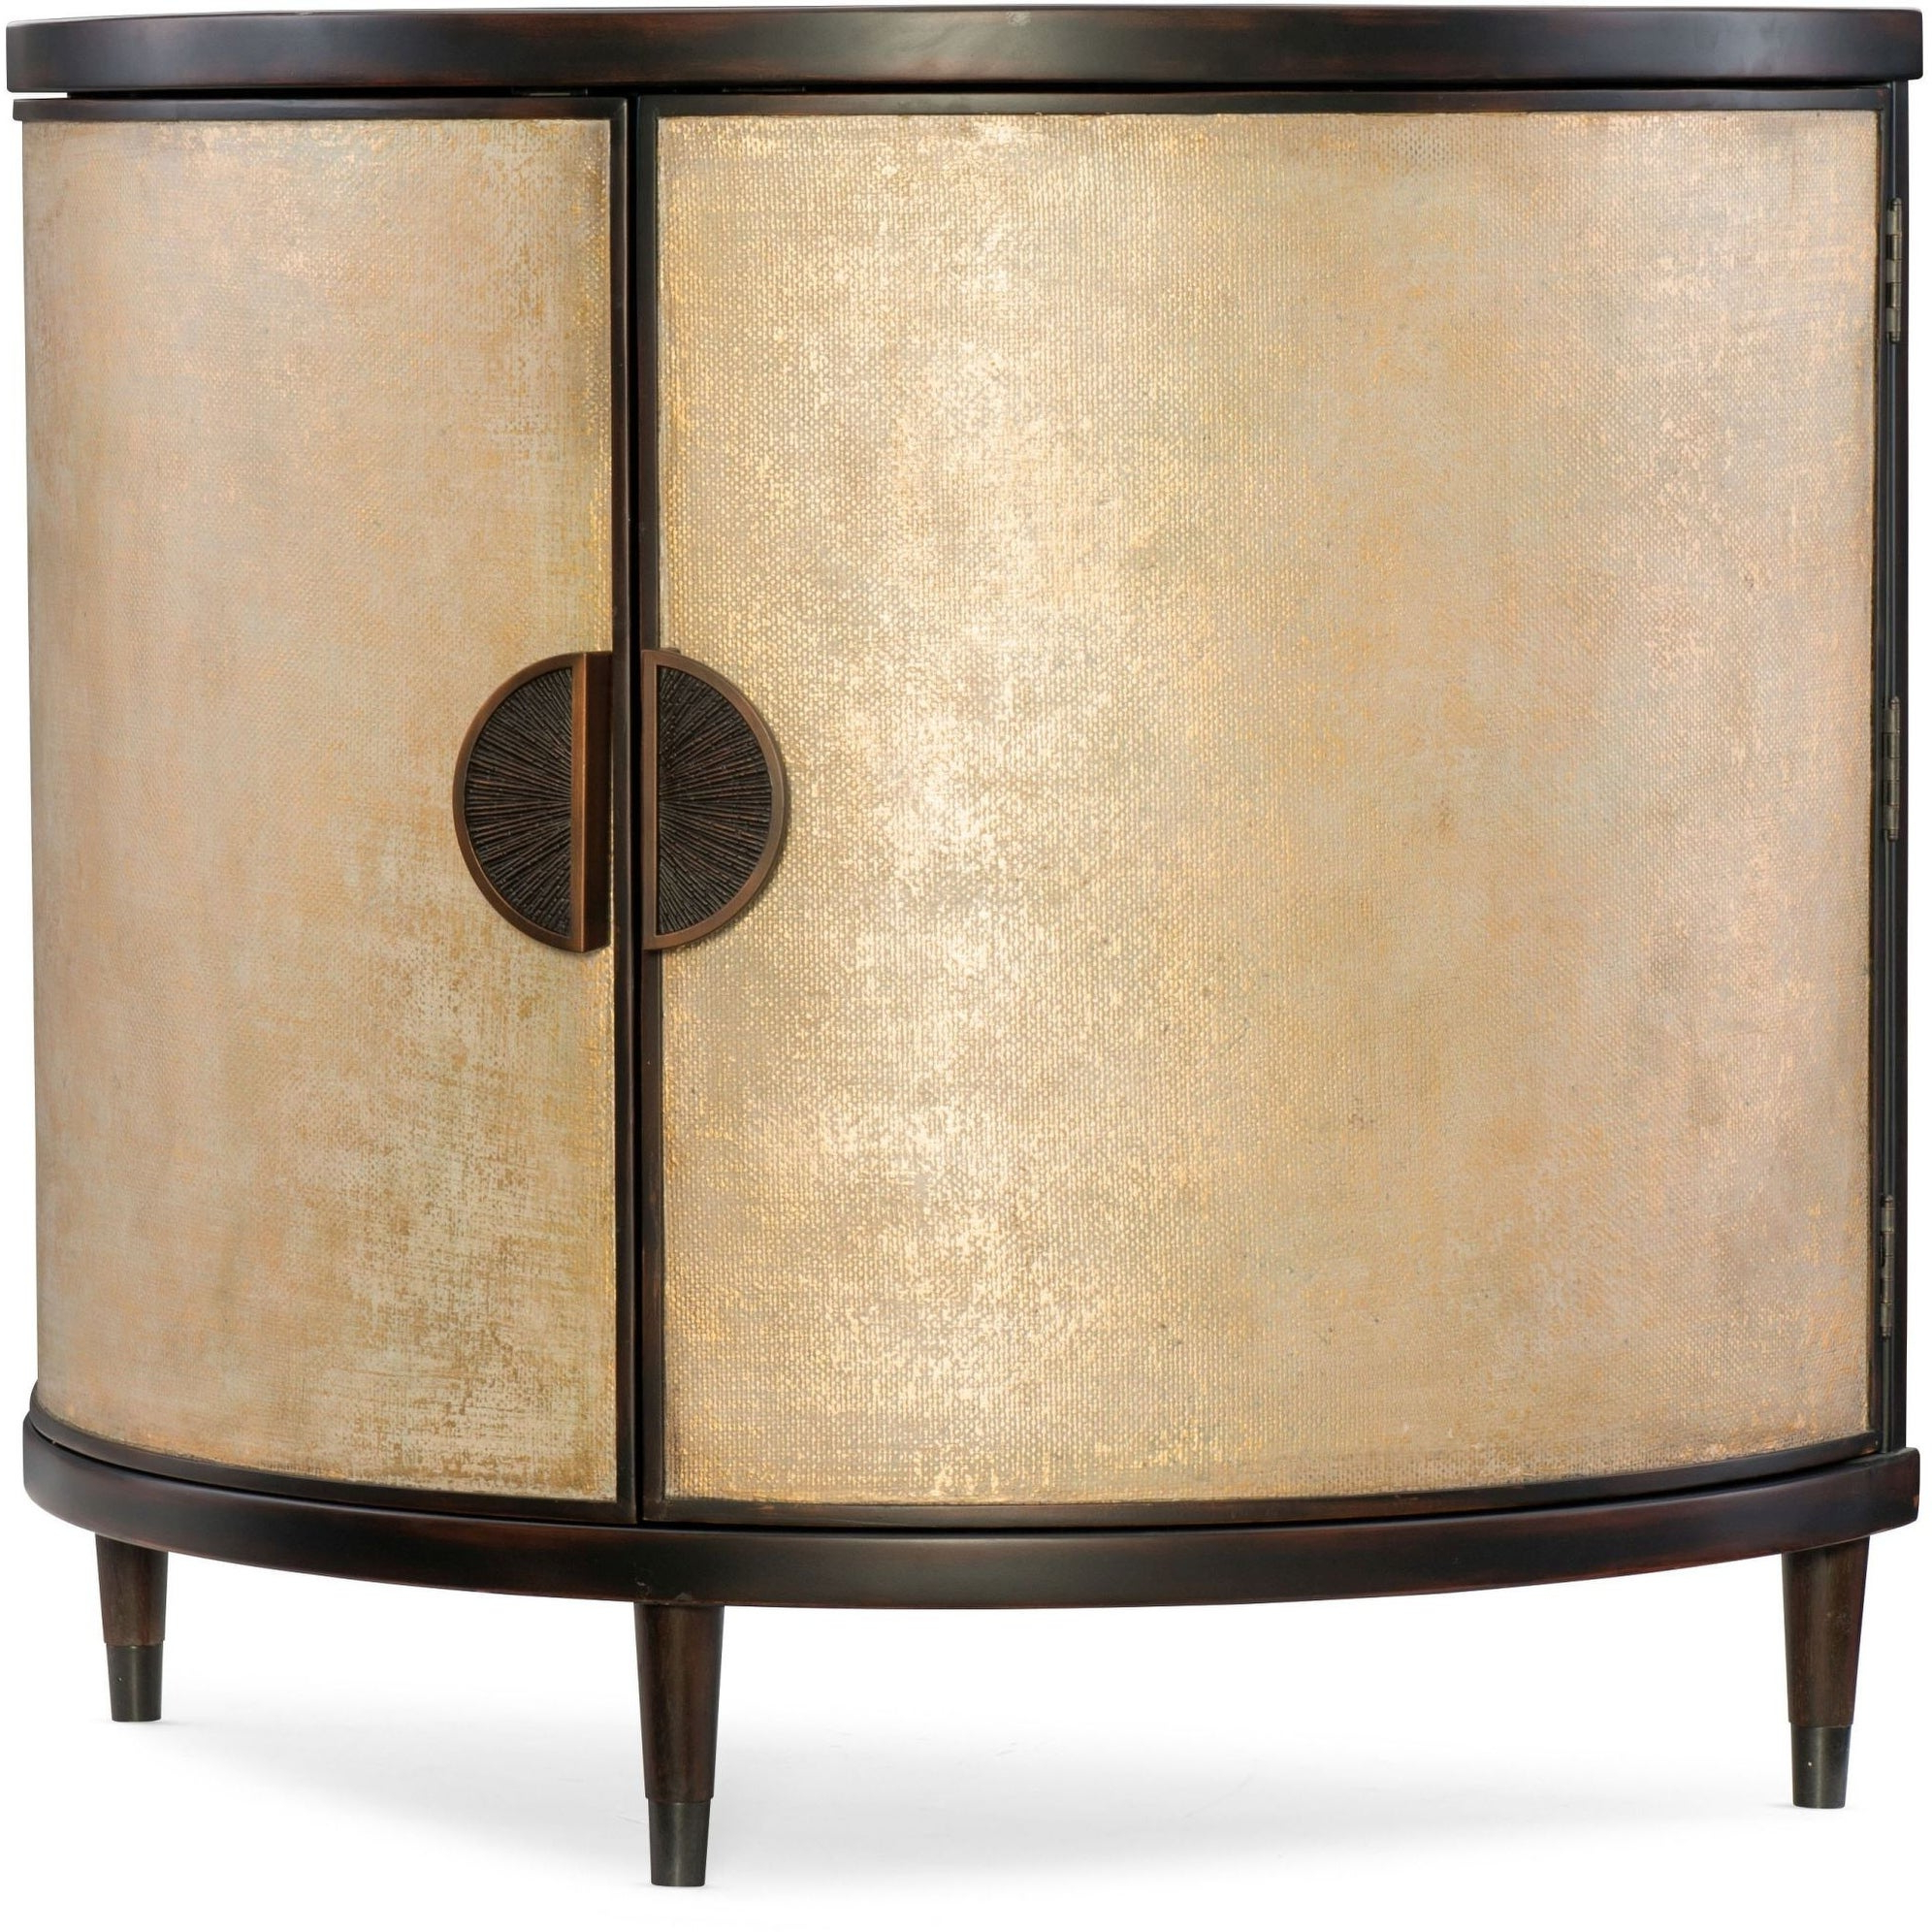 "Hooker Furniture 638 85314 Gld 42 1/4"" Wide Hardwood Cabinet From The  Melange – Em Demilune Collection – Black And Shimmer Cream Throughout Widely Used Melange Brockton Sideboards (View 6 of 20)"